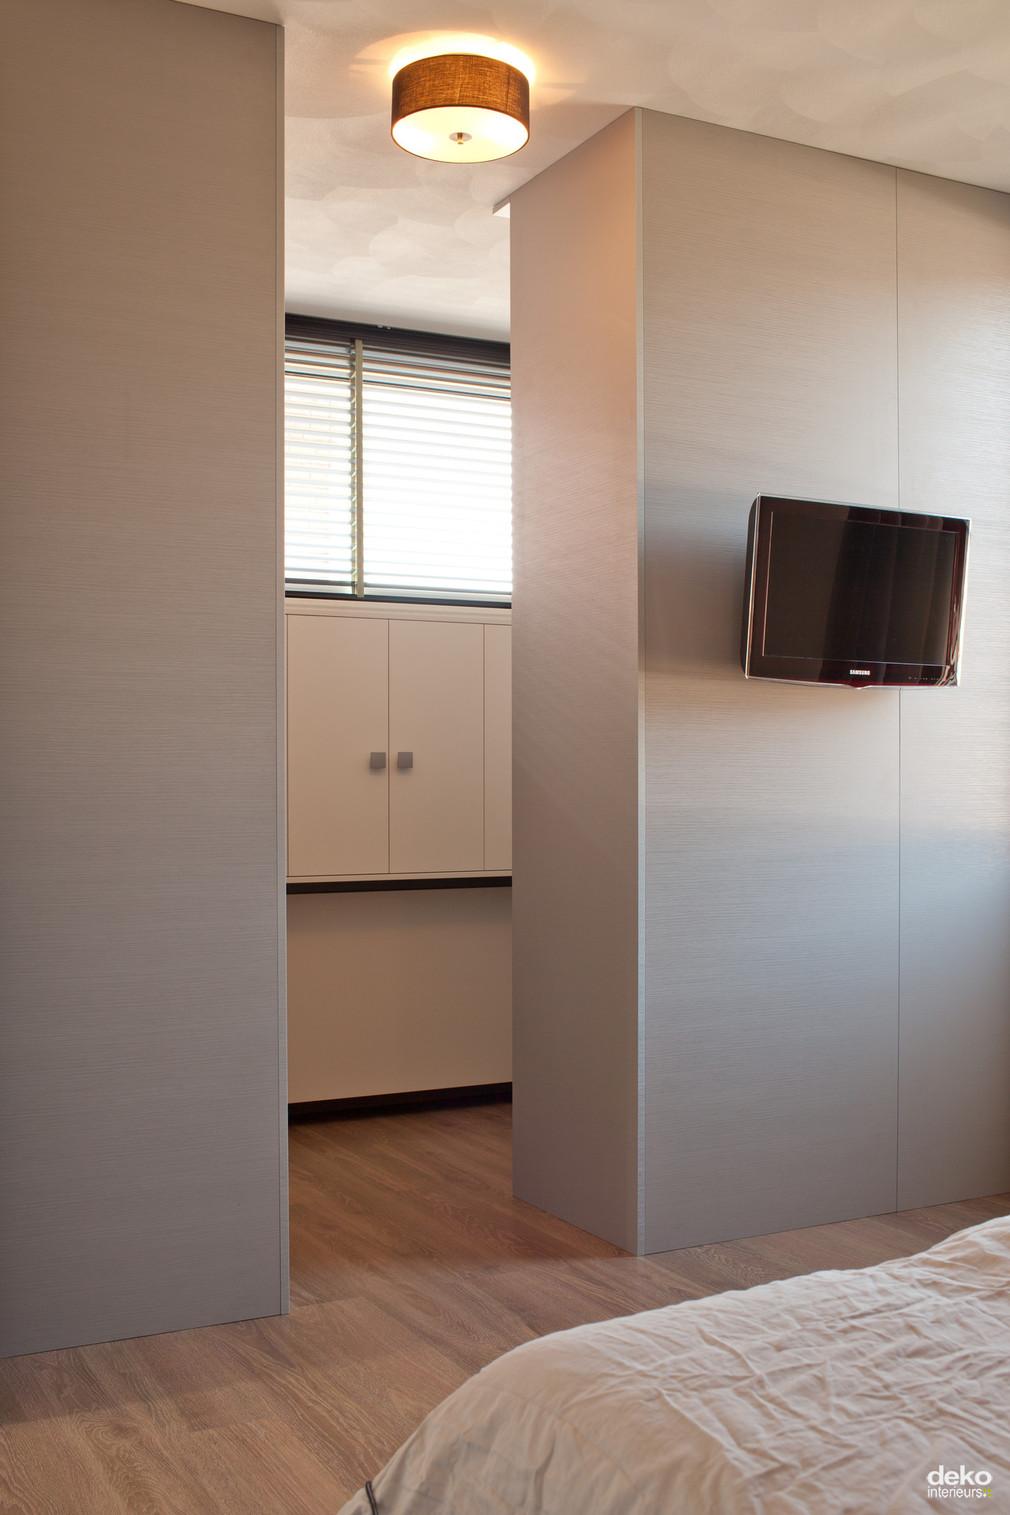 https://www.deko-interieurs.nl/af/uploads/c/1010x/1/4/moderne-inloopkast-aanzicht-vanuit-slaapkamer.jpg